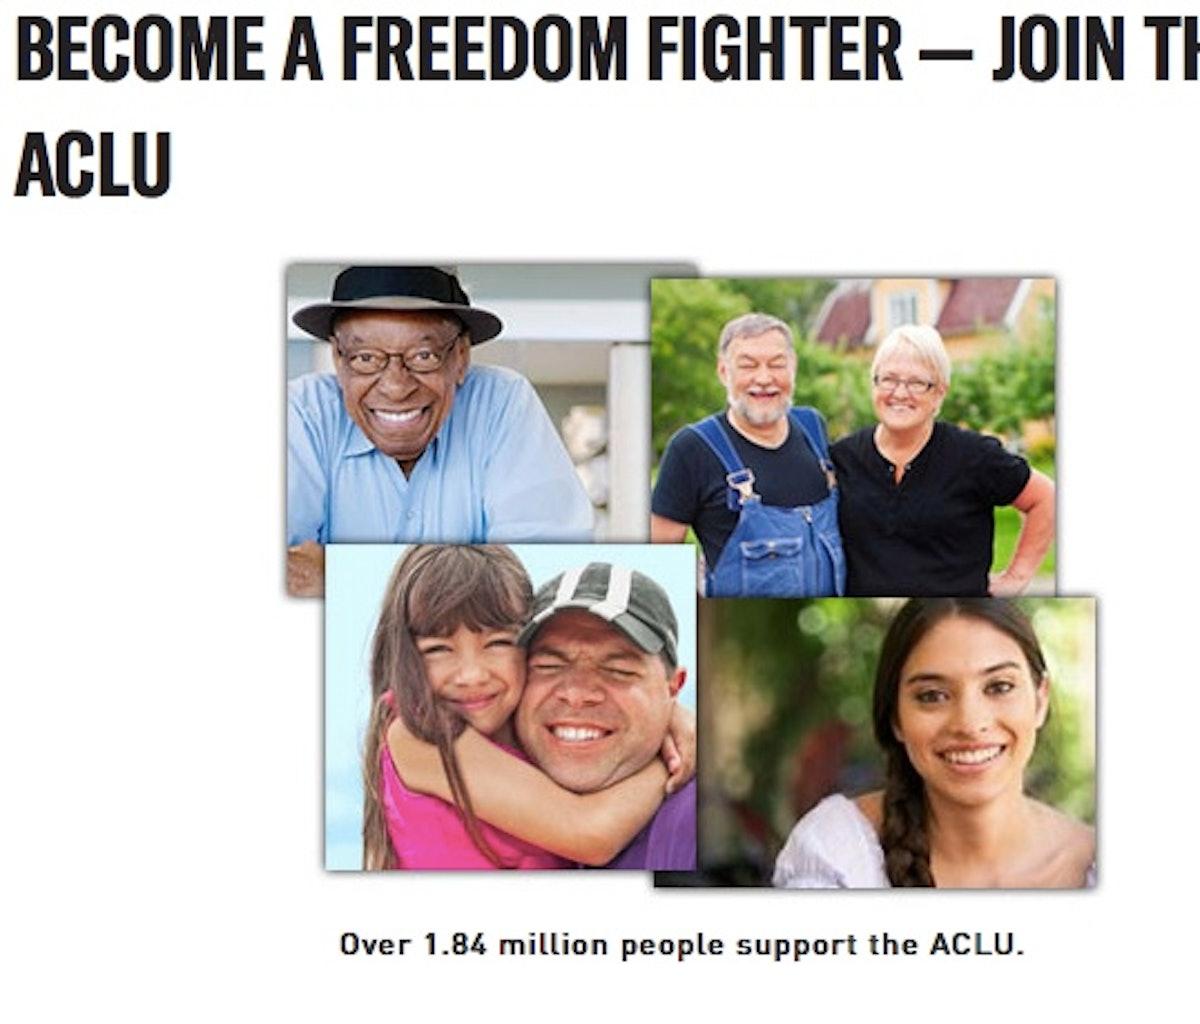 ACLU Membership